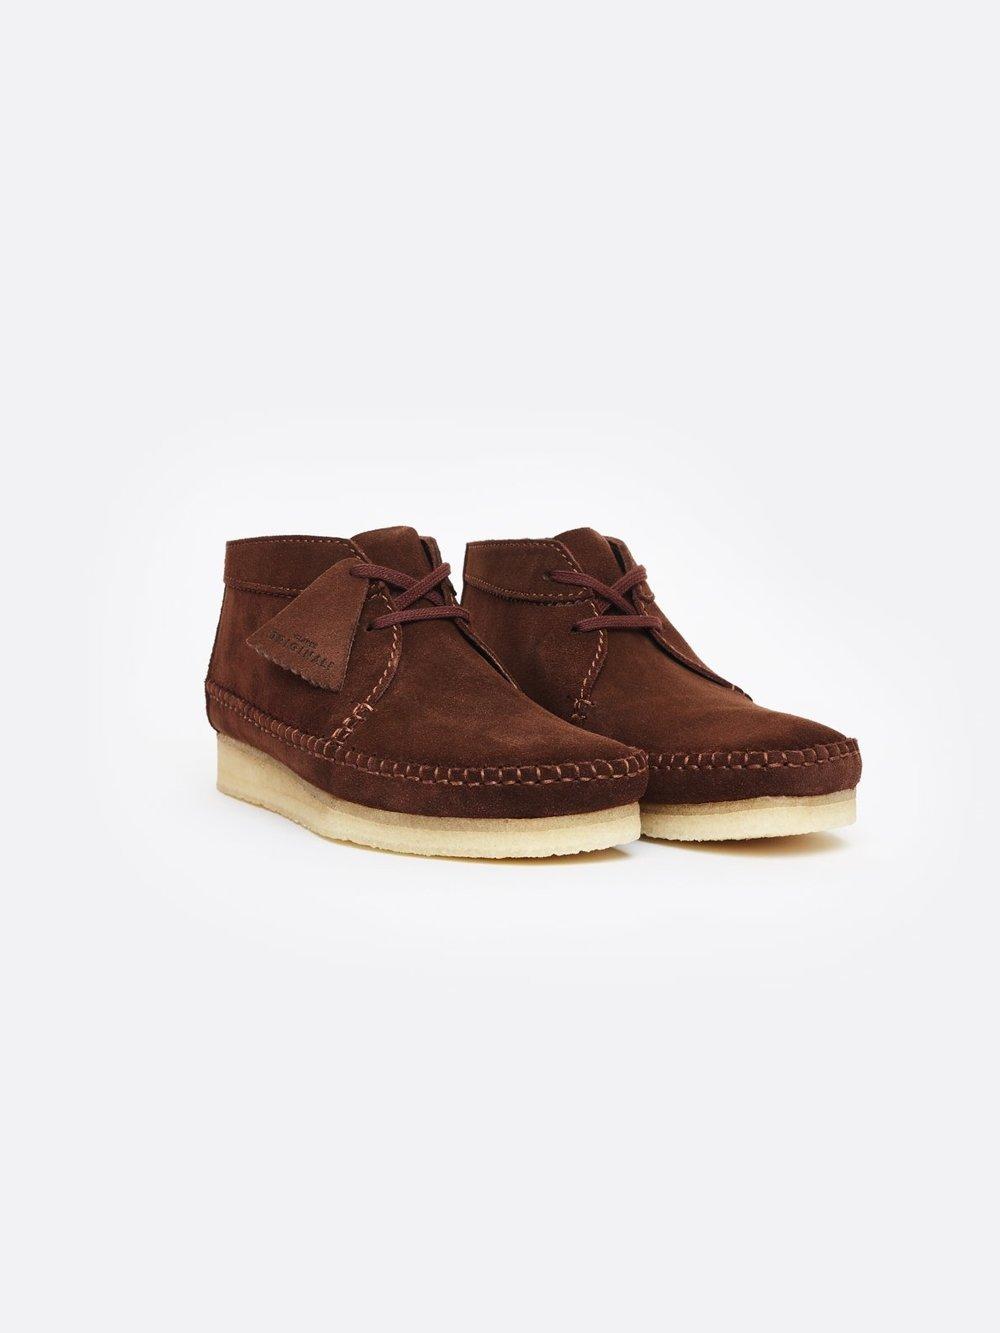 Clarks weaver boots